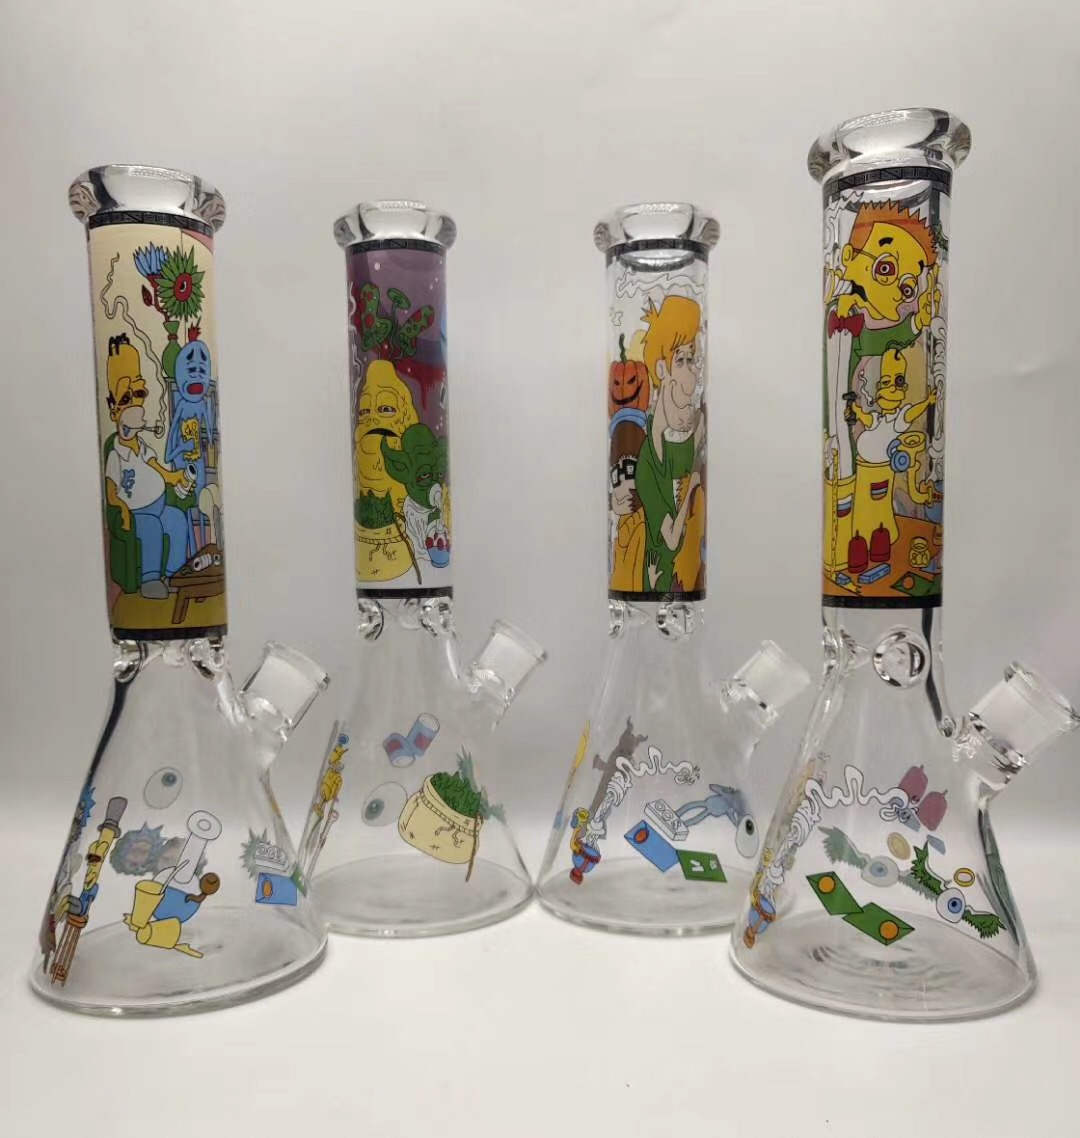 America USA glass bongs hand pipe beaker pipe smoking glass pipe